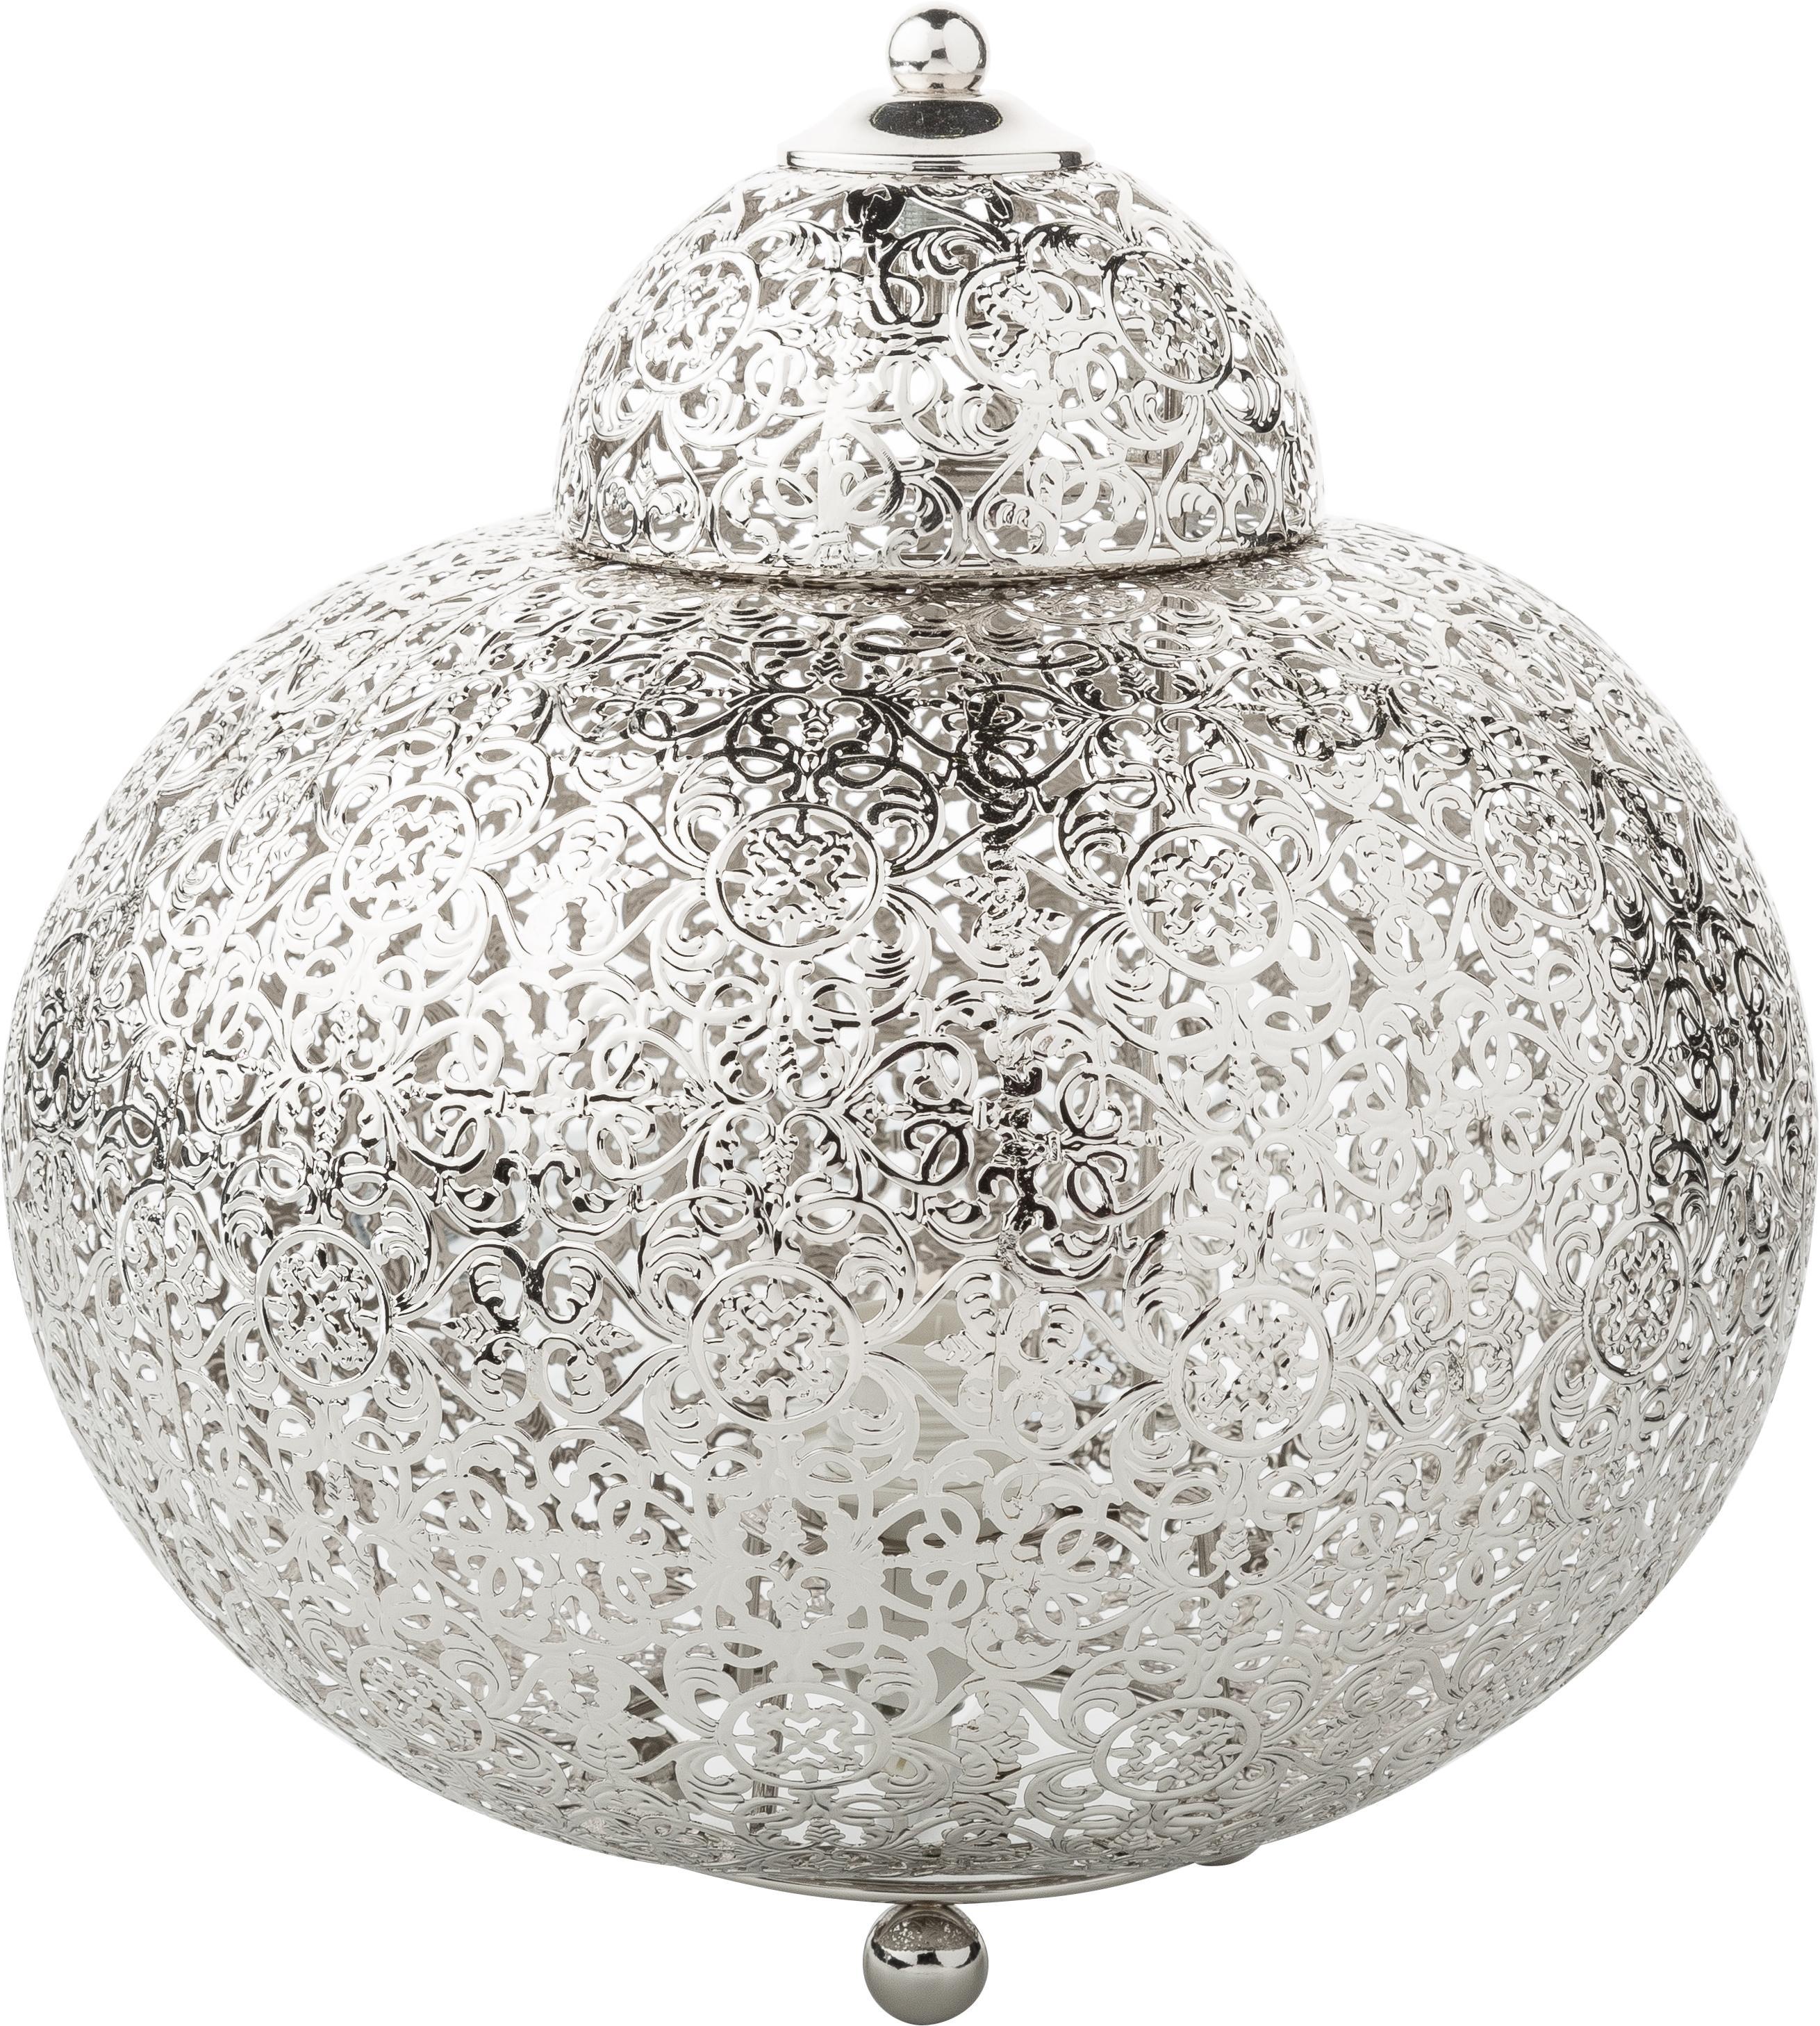 Kleine boho tafellamp Marocco, Nikkel, Nikkelkleurig, Ø 26 x H 26 cm